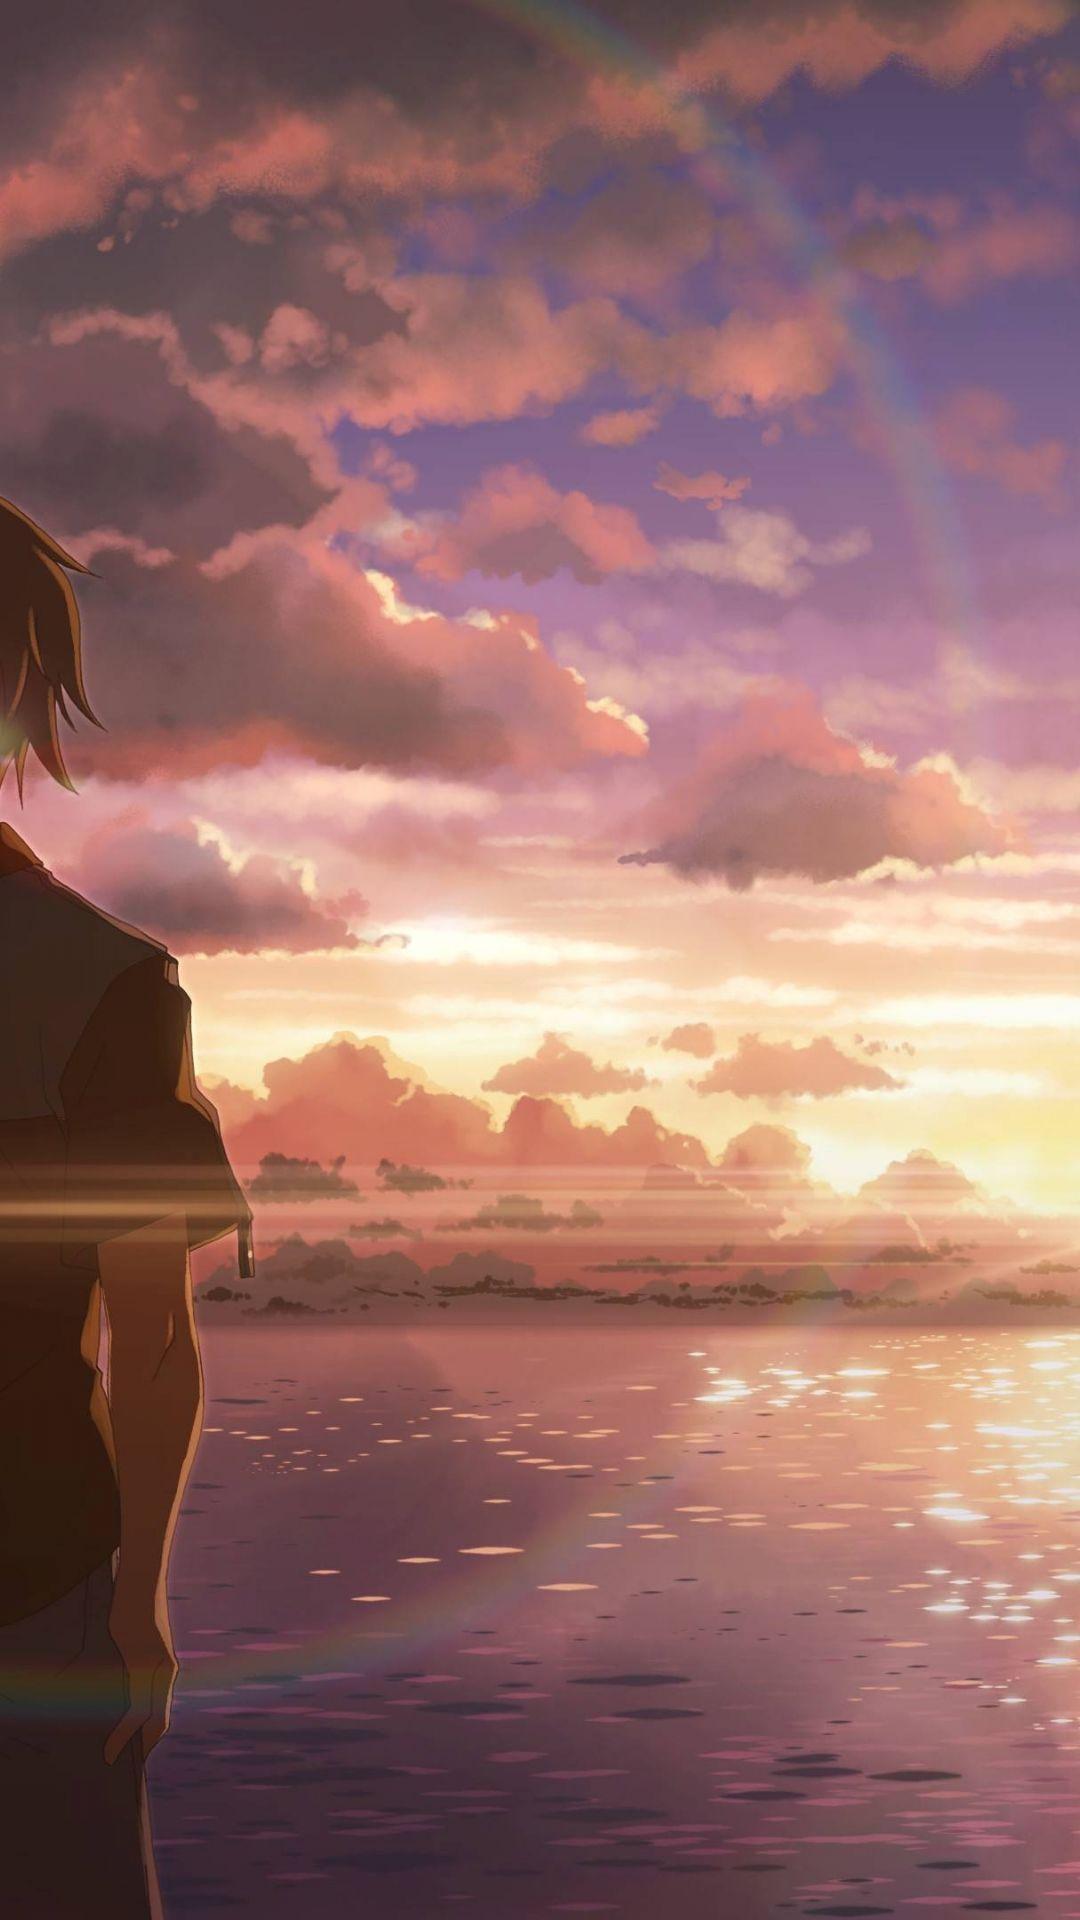 Sad Anime iPhone xs wallpaper